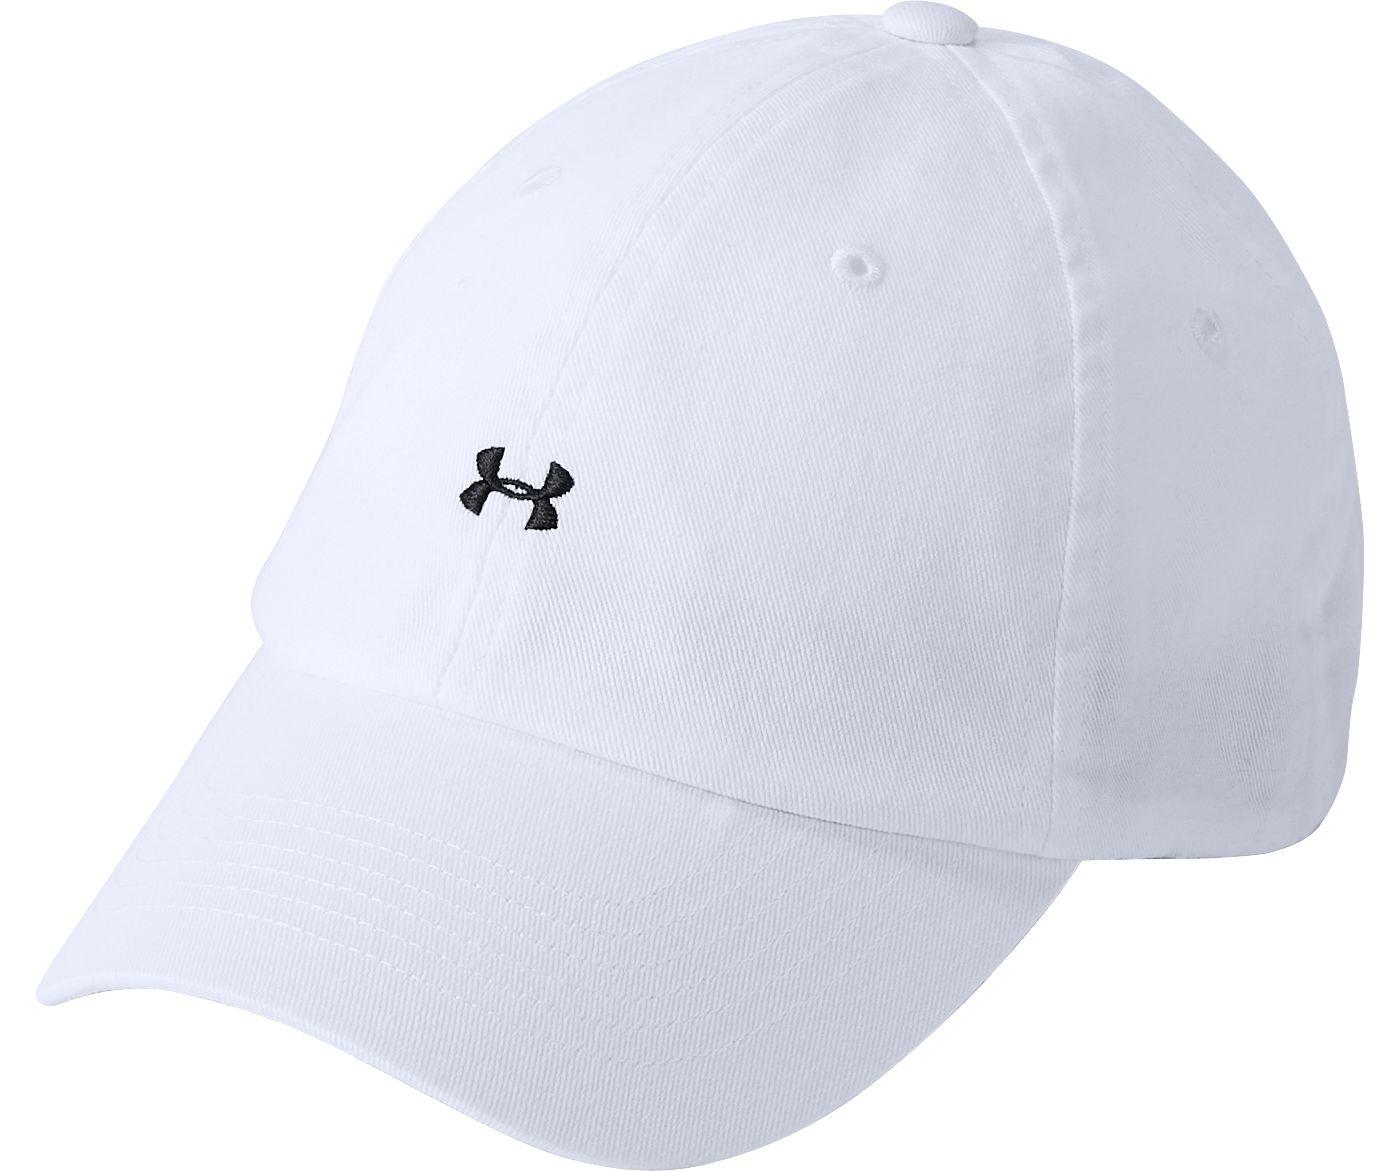 Under Armour Women's Favorite Mini Logo Hat